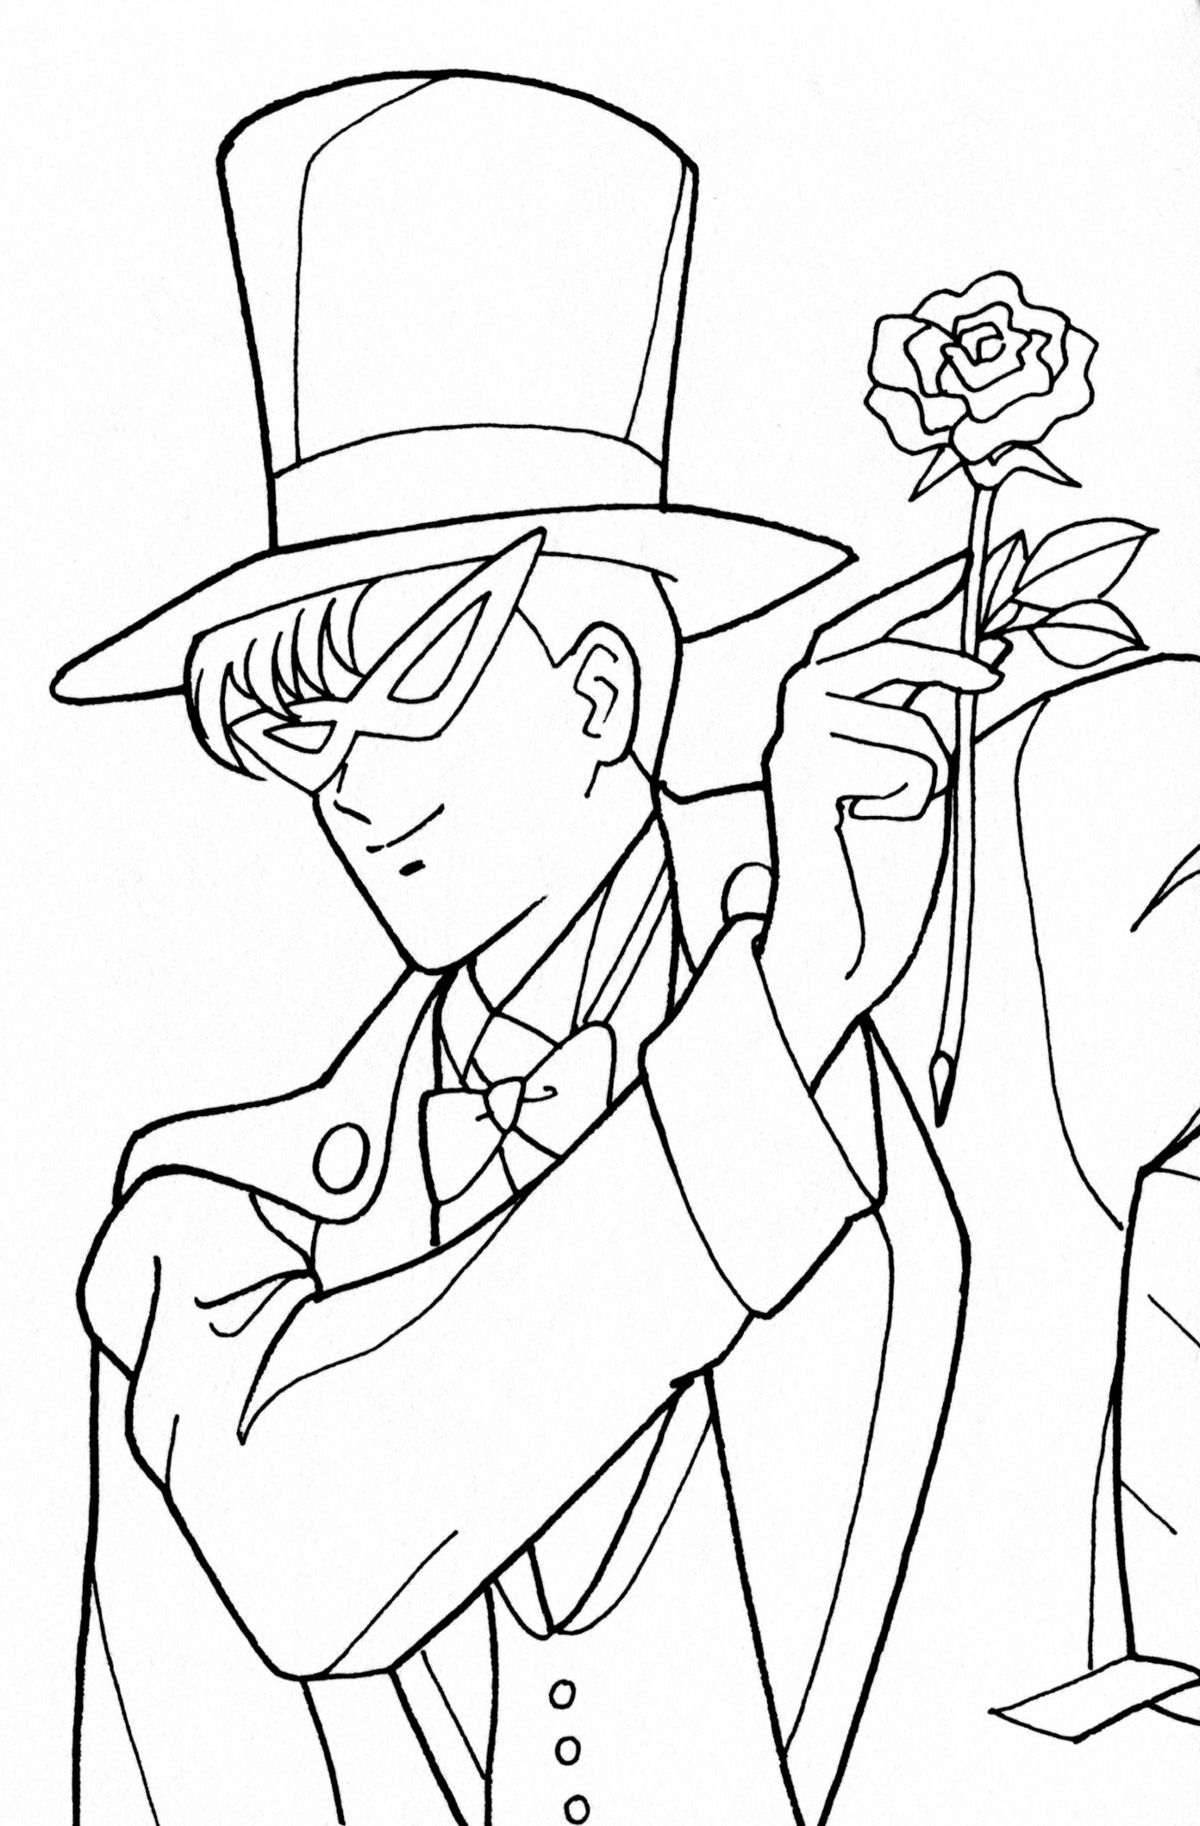 tuxcedo mask coloring pages | Tuxedo Kamen Coloring Page // #sailormoon | Sailor moon ...